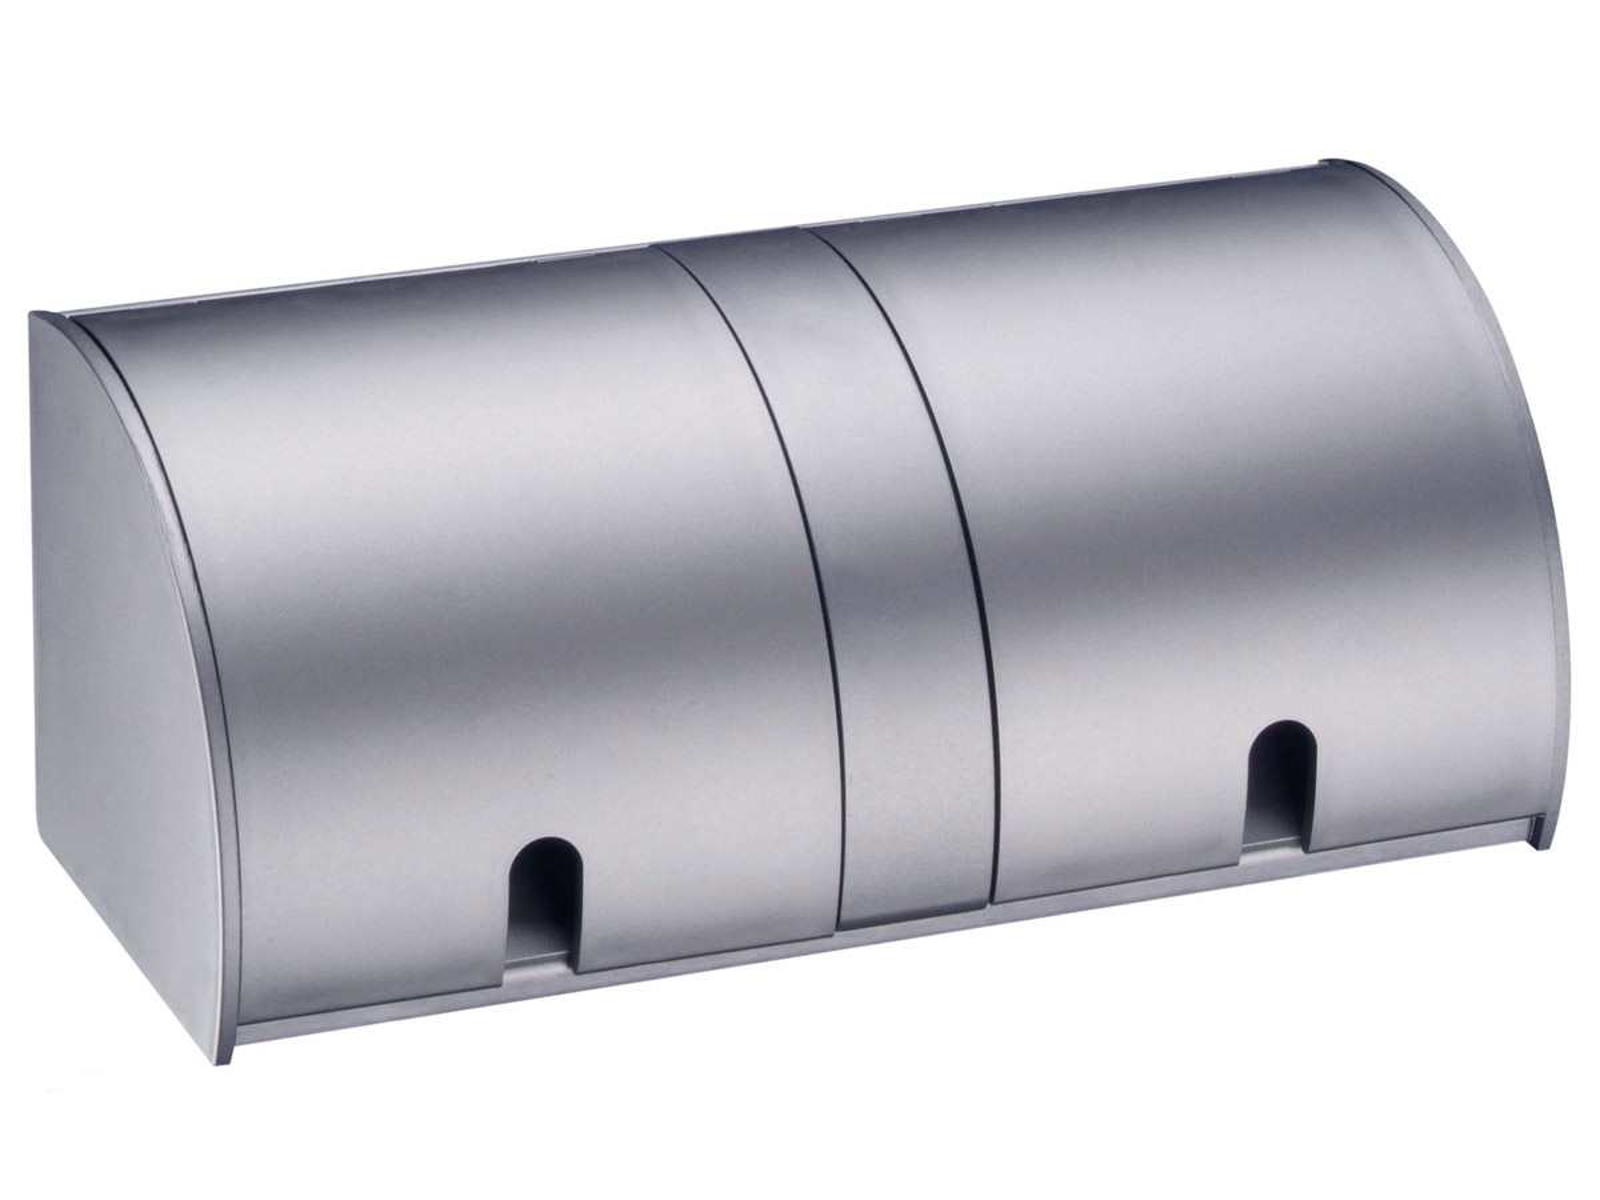 Thebo E 1000/ST 2 - 19107 ST 2 Steckdosenelement Aluminium